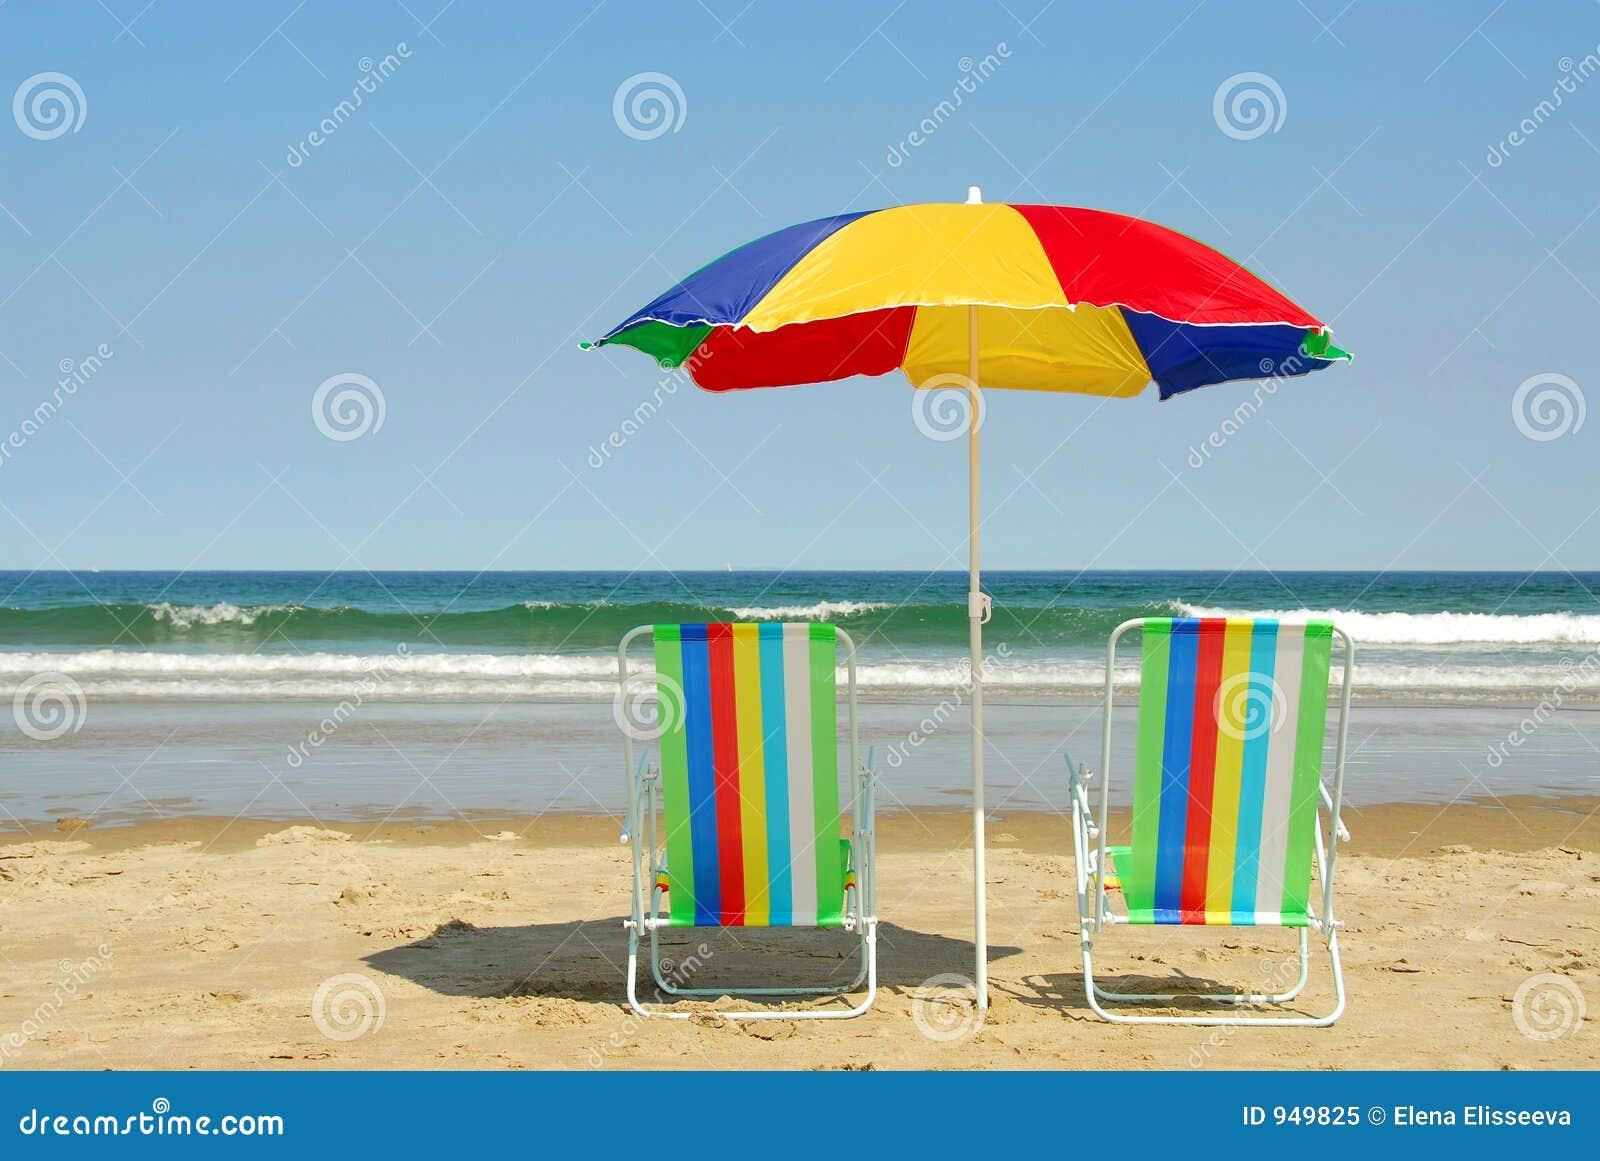 Ligstoelen en paraplu